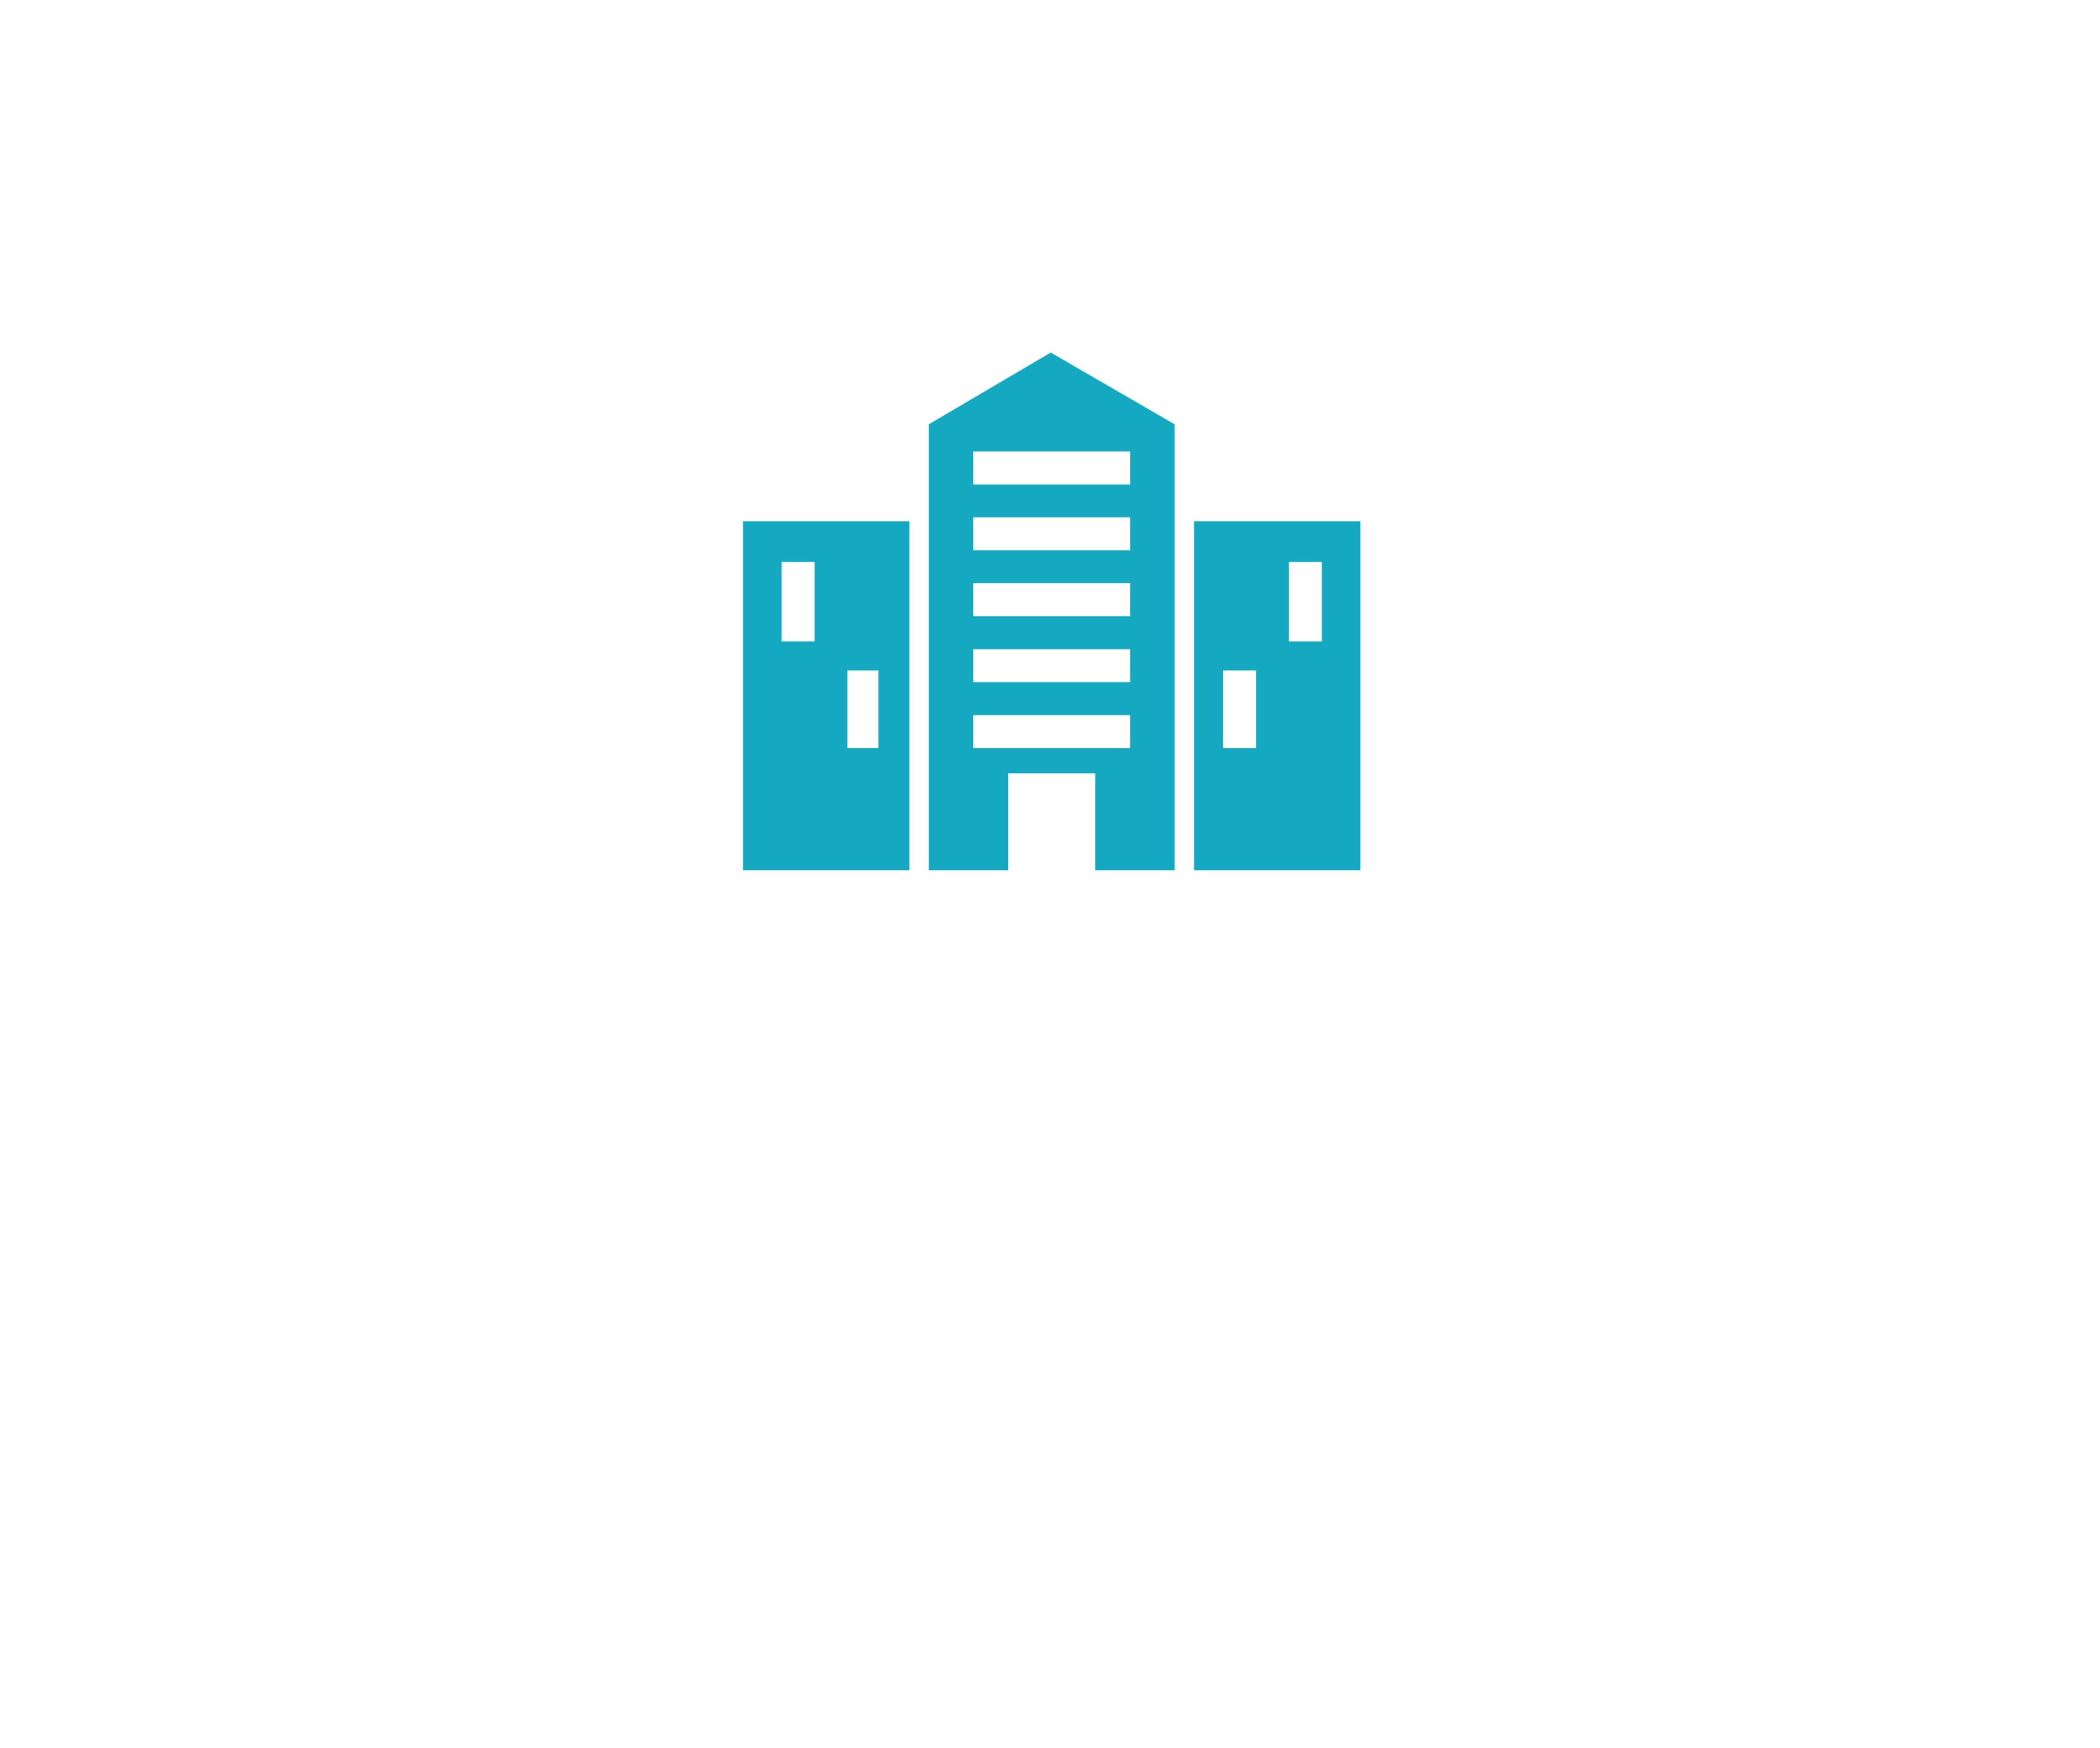 Lynwood Holdings